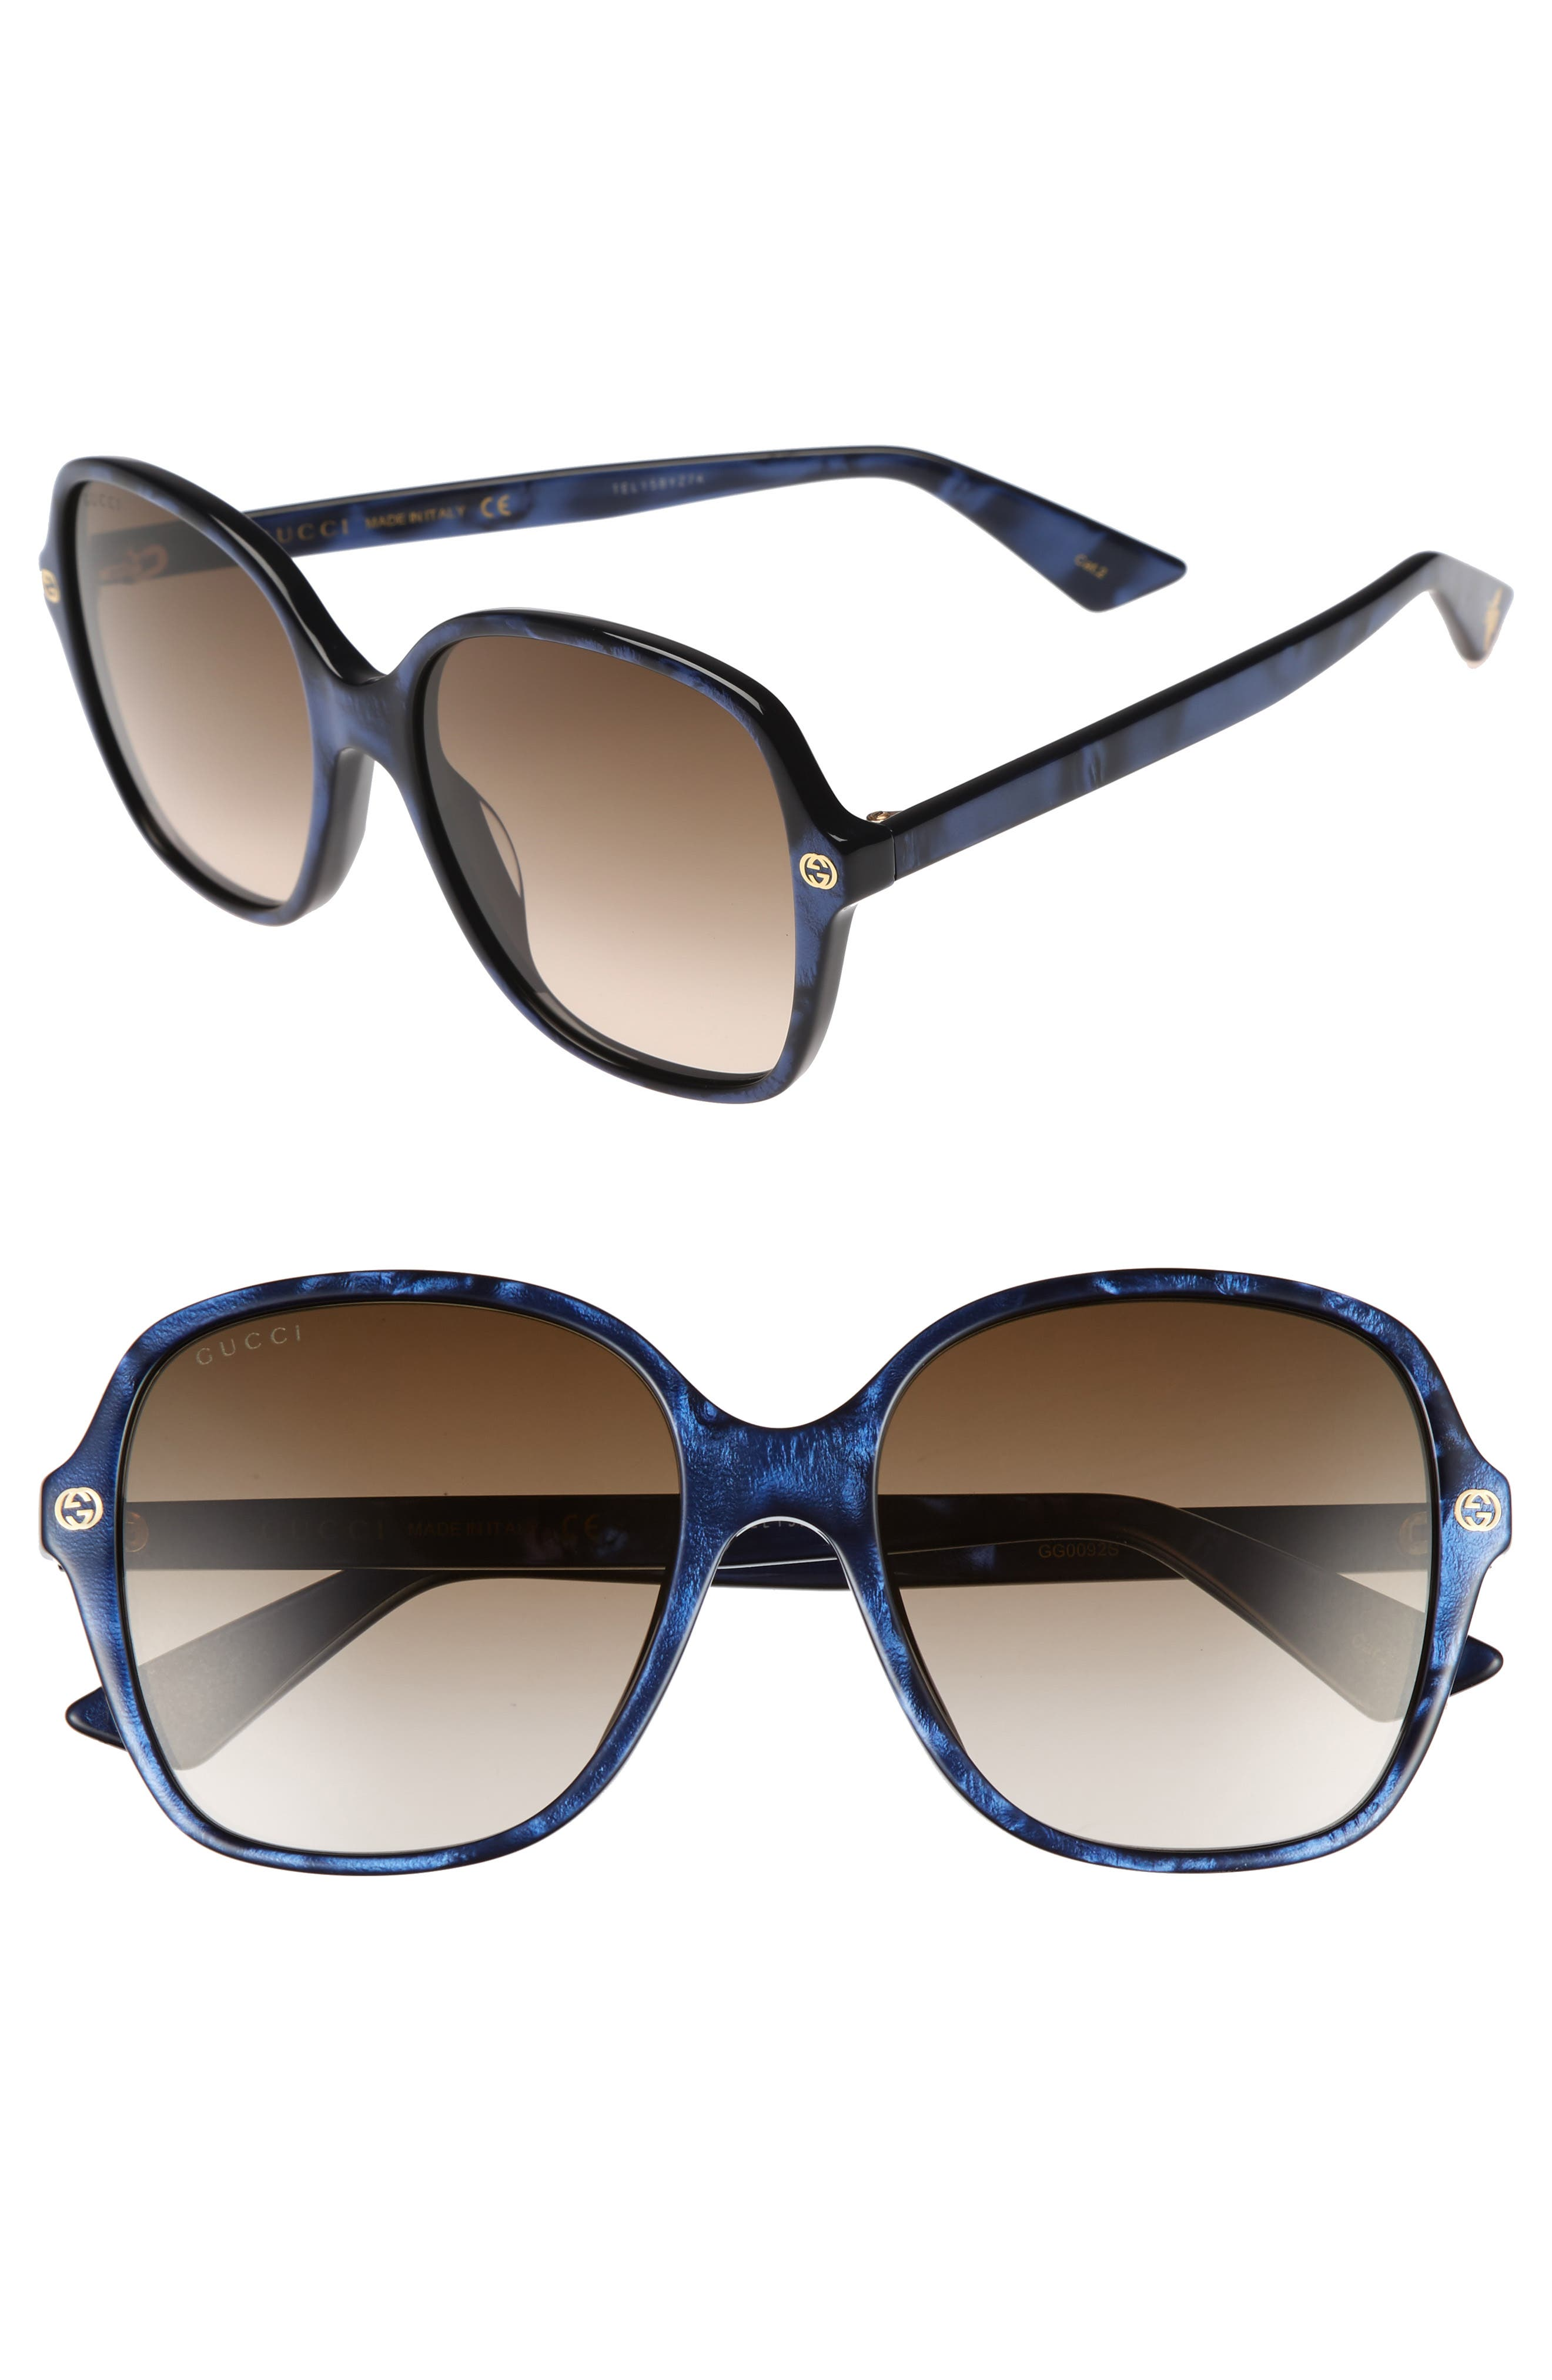 55mm Gradient Sunglasses,                         Main,                         color, Blue/ Brown